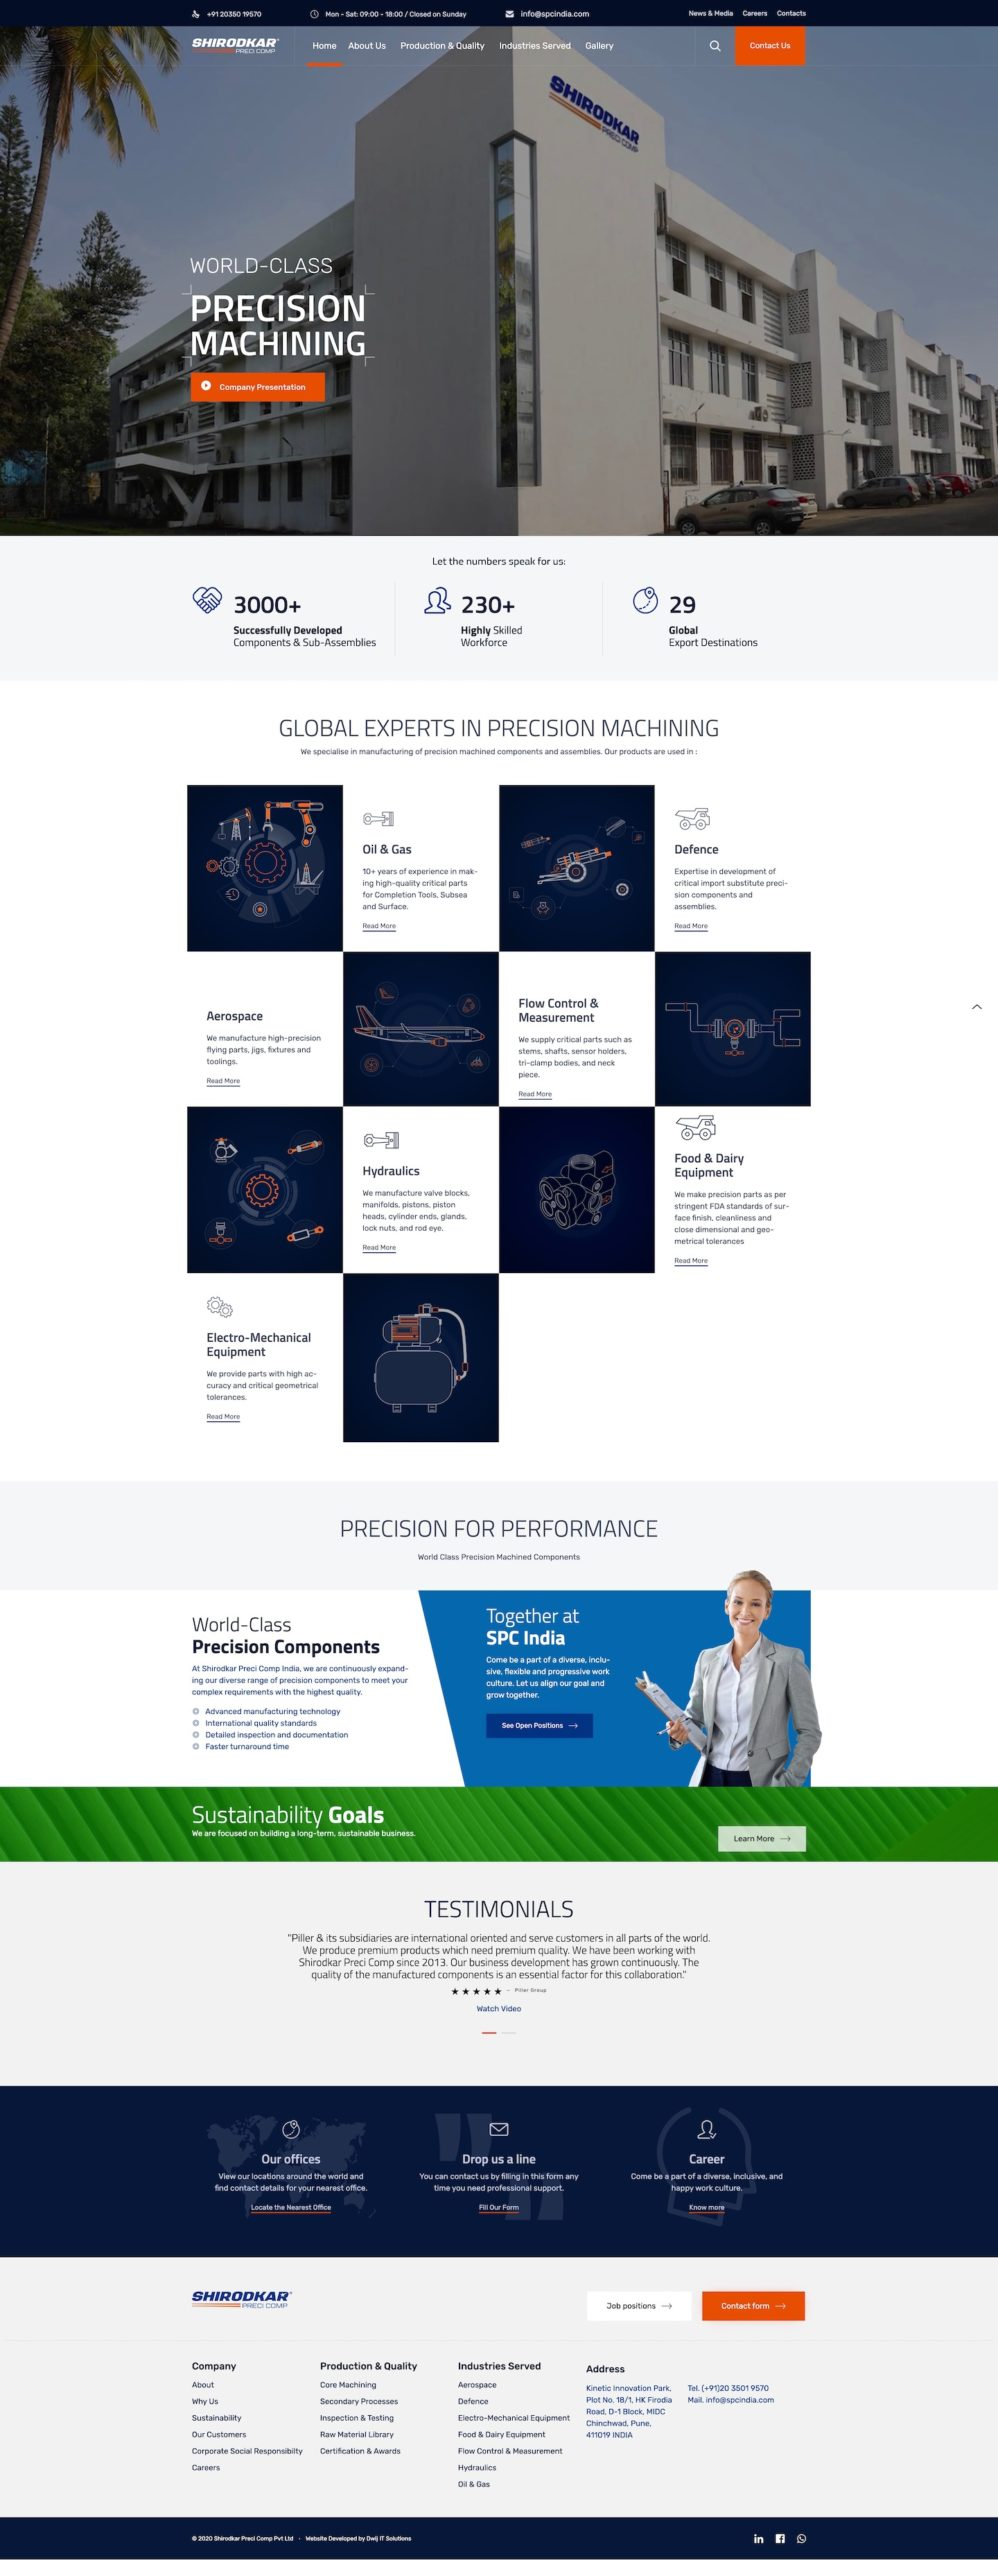 spcindia.com-manufacturing-website-development-pune-india-home